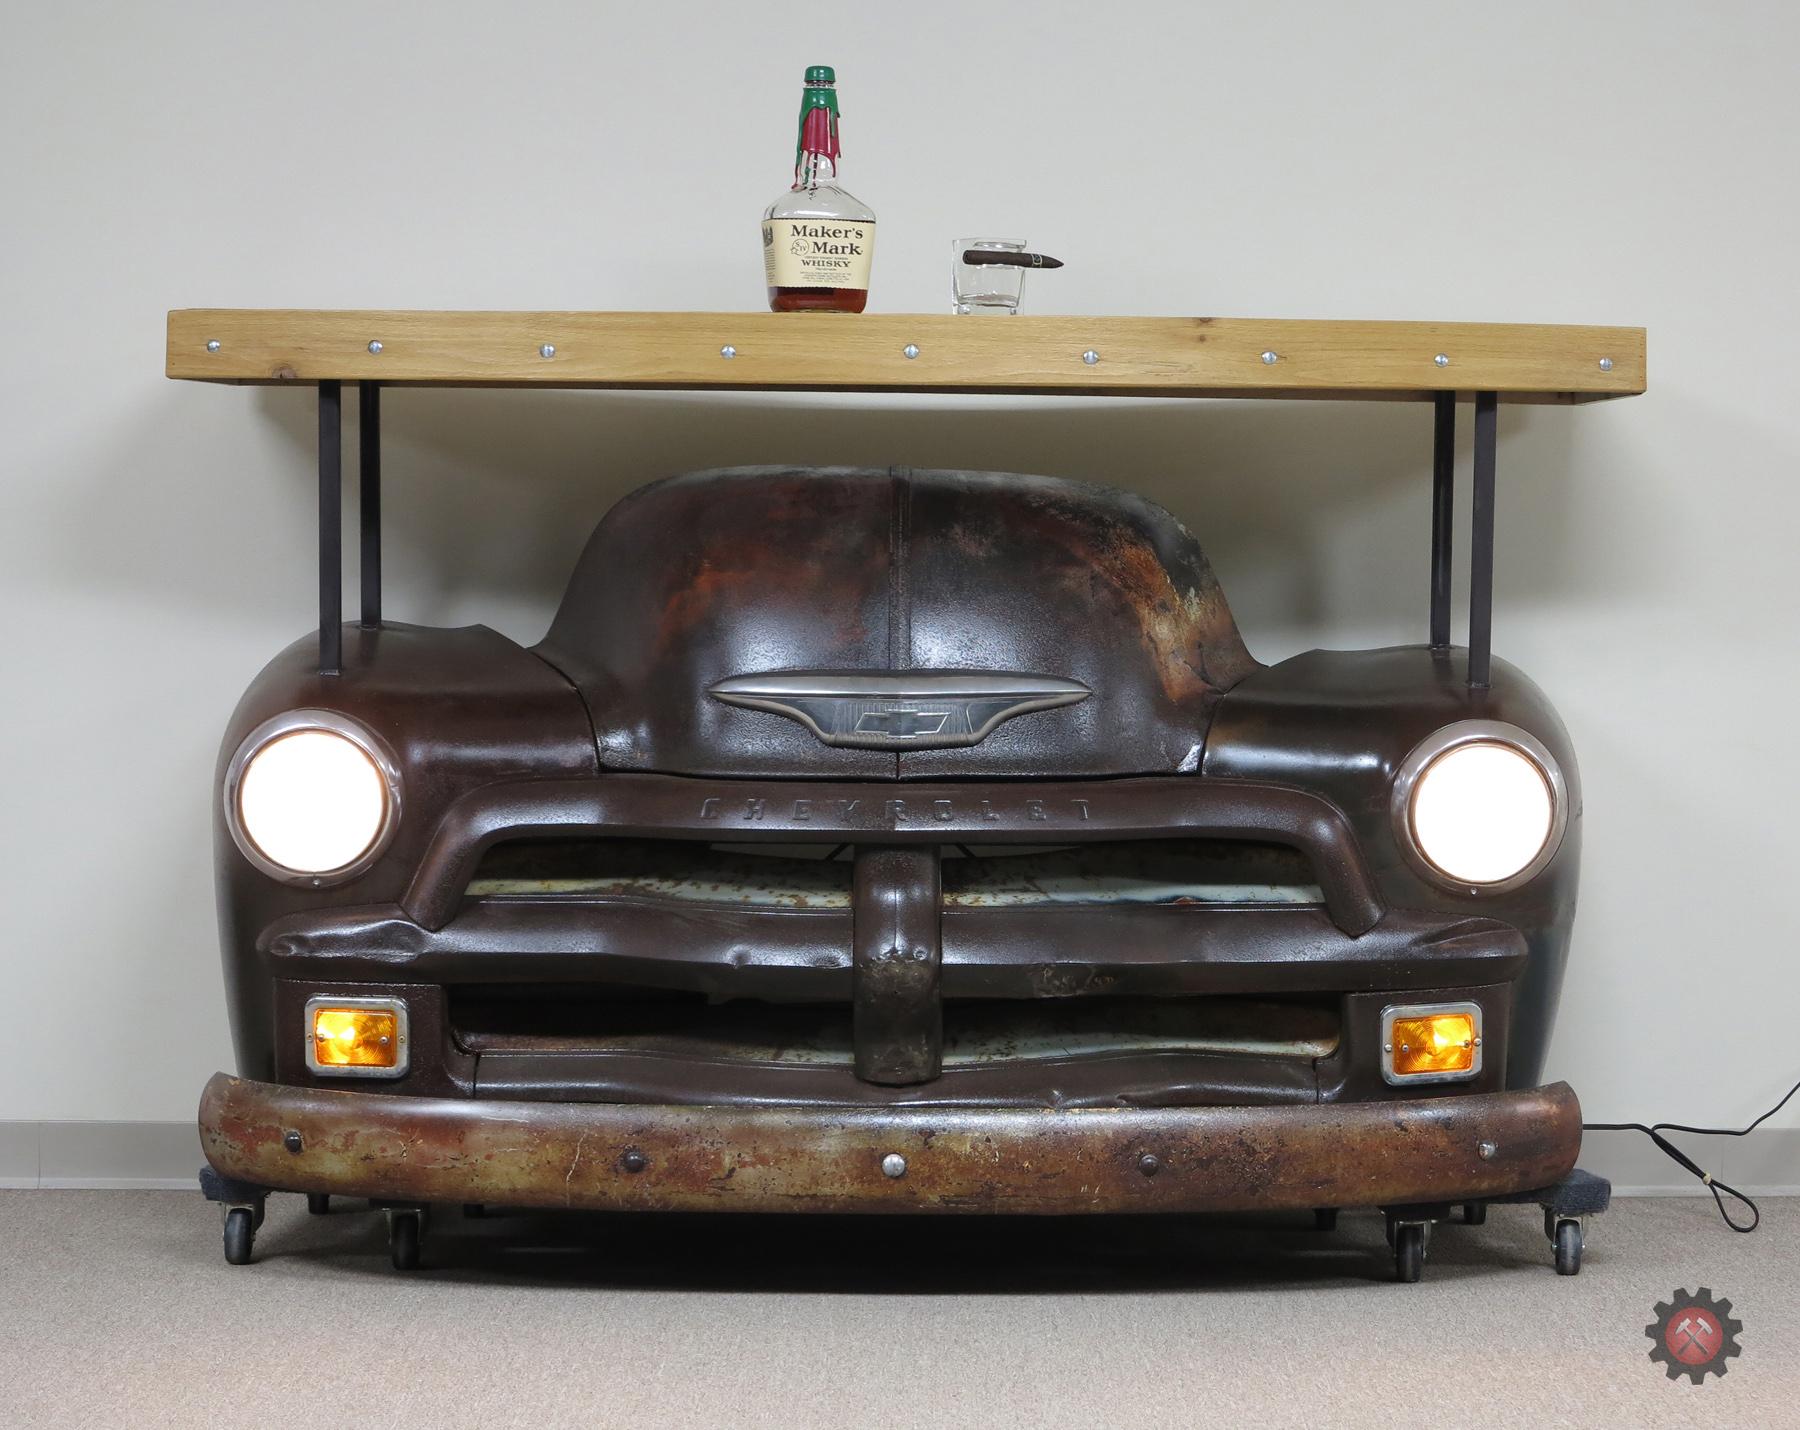 54/55 Chevrolet Truck Walk Behind Bar